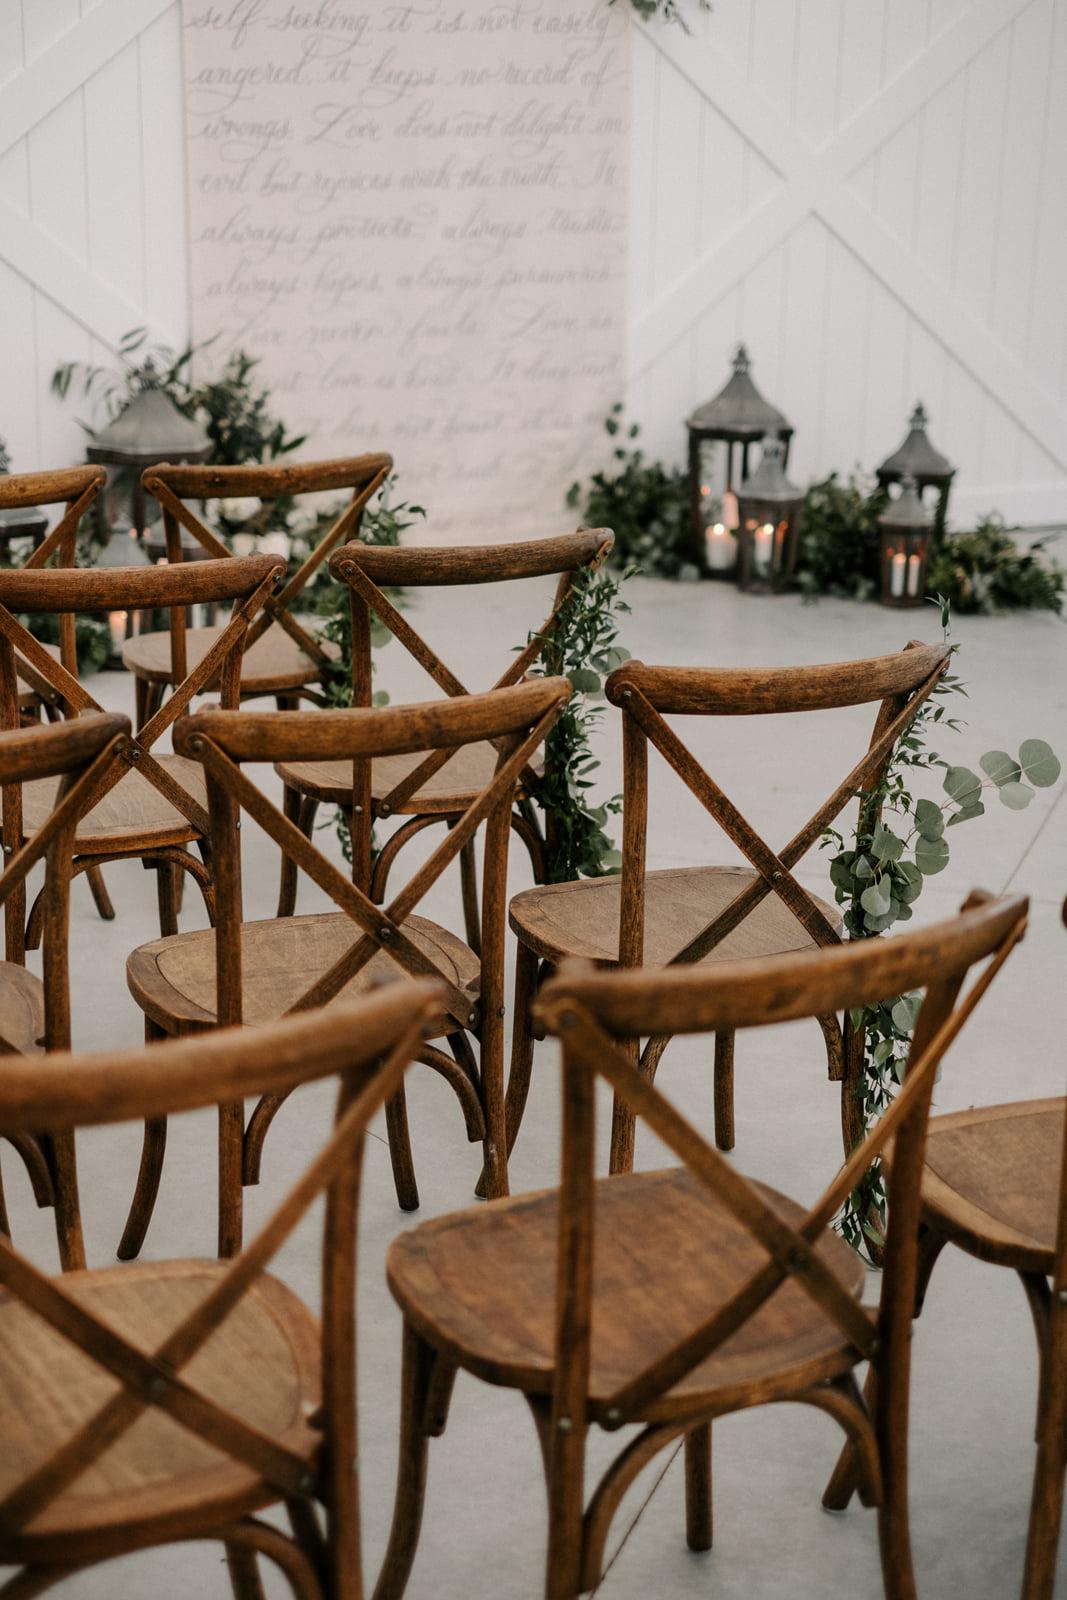 The-Barn-at-Grace-Hill-Wichita-Wedding-Venue-105.jpg